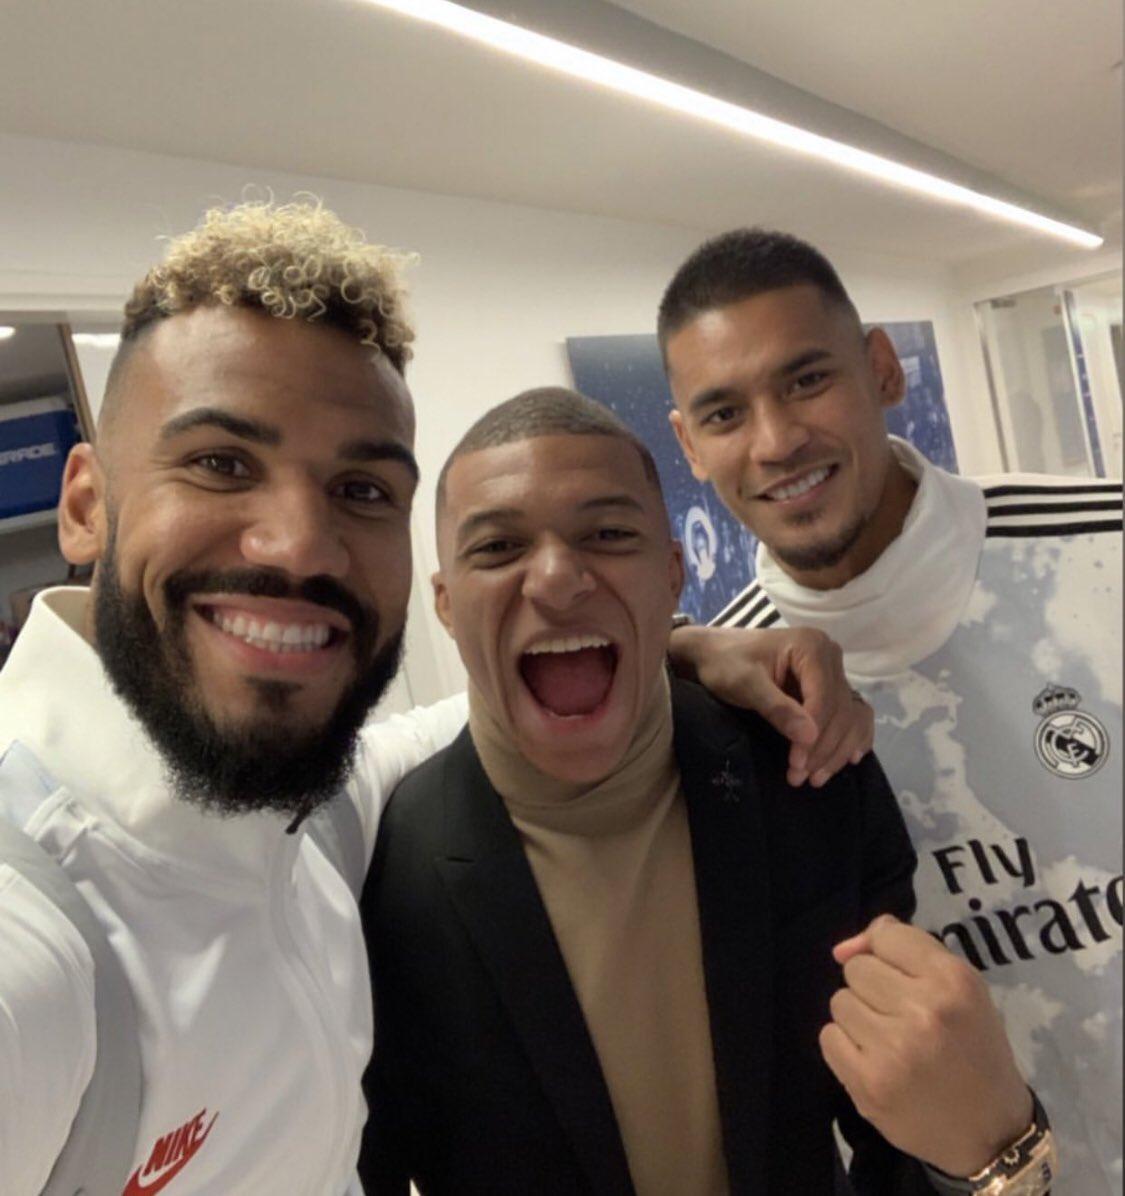 Real Madrid : Alphonse Areola s'excuse pour son selfie avec Kylian Mbappé et Eric Maxim Choupo-Moting